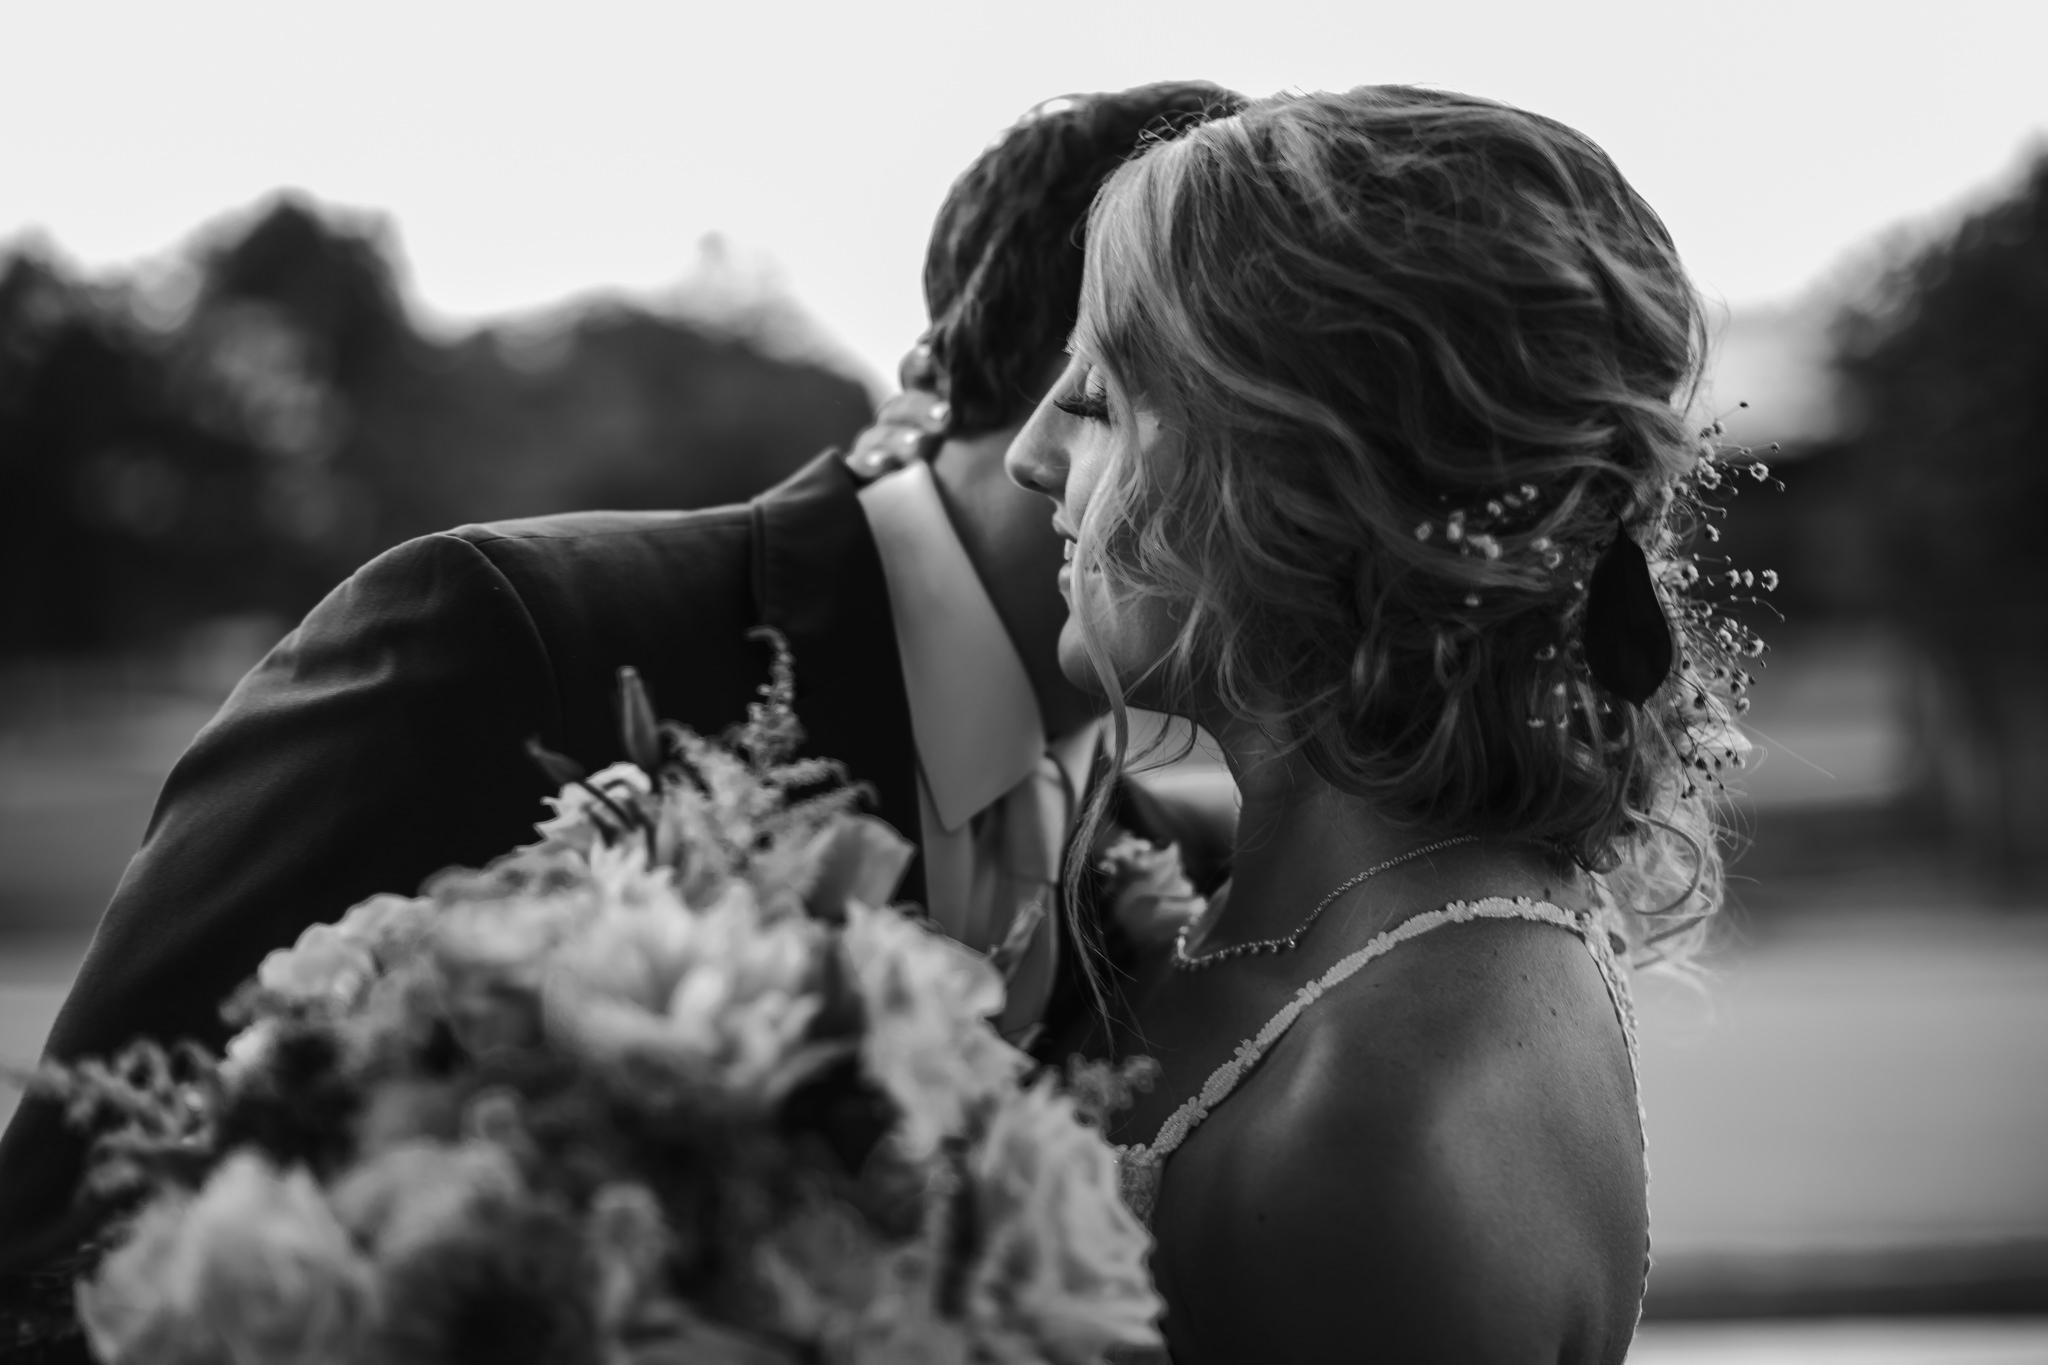 cassie-cook-photography-memphis-wedding-photographer-hedge-farm-wedding-venue-240.jpg